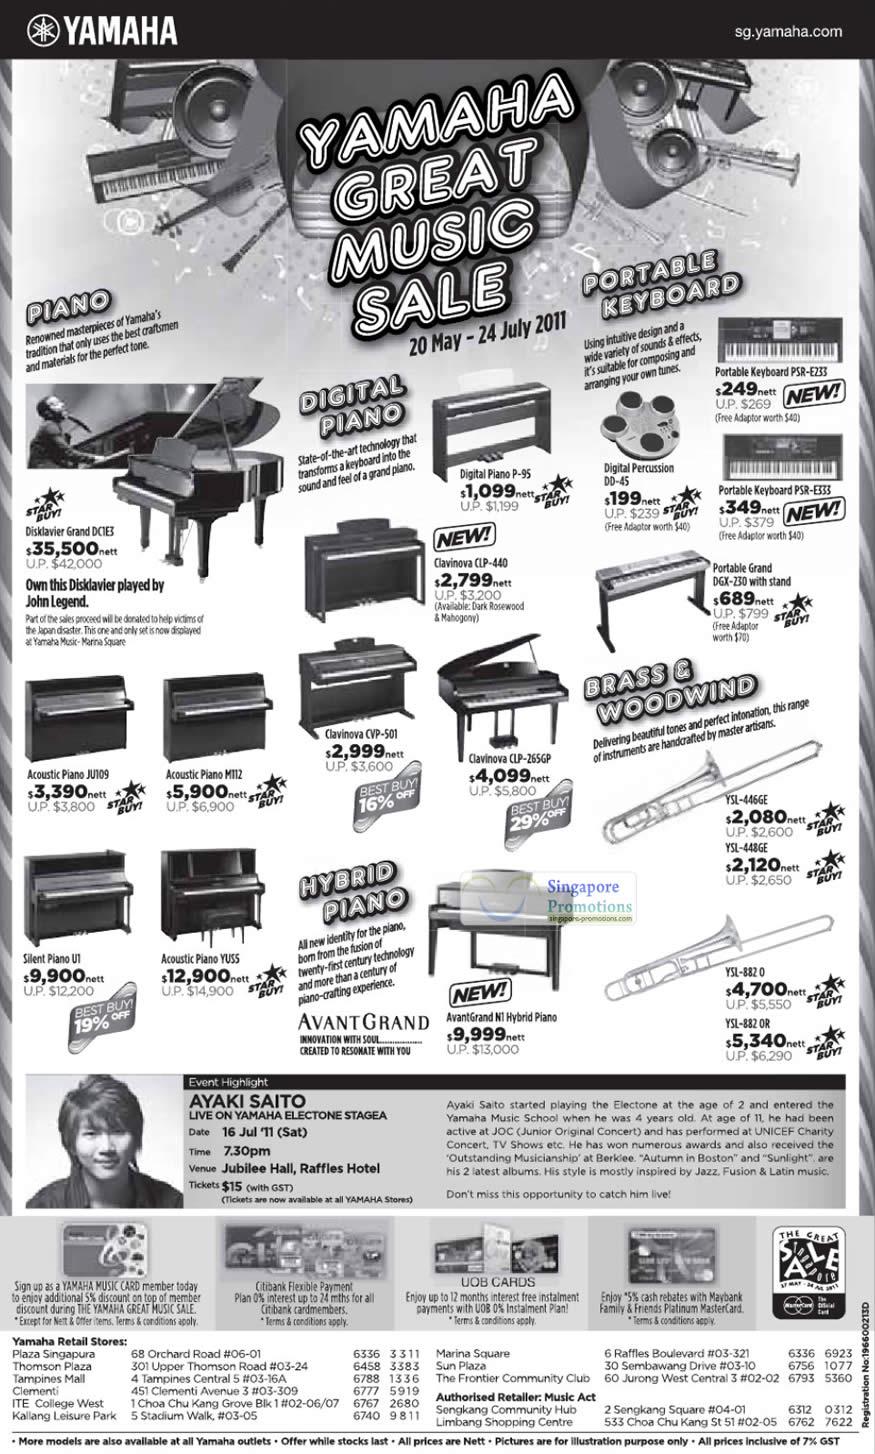 24 Jun Piano, Digital Piano, Portable Keyboard, Clavinova, Portable Grand, Acoustic Piano, Silent, Hybrid, Brass Woodwind